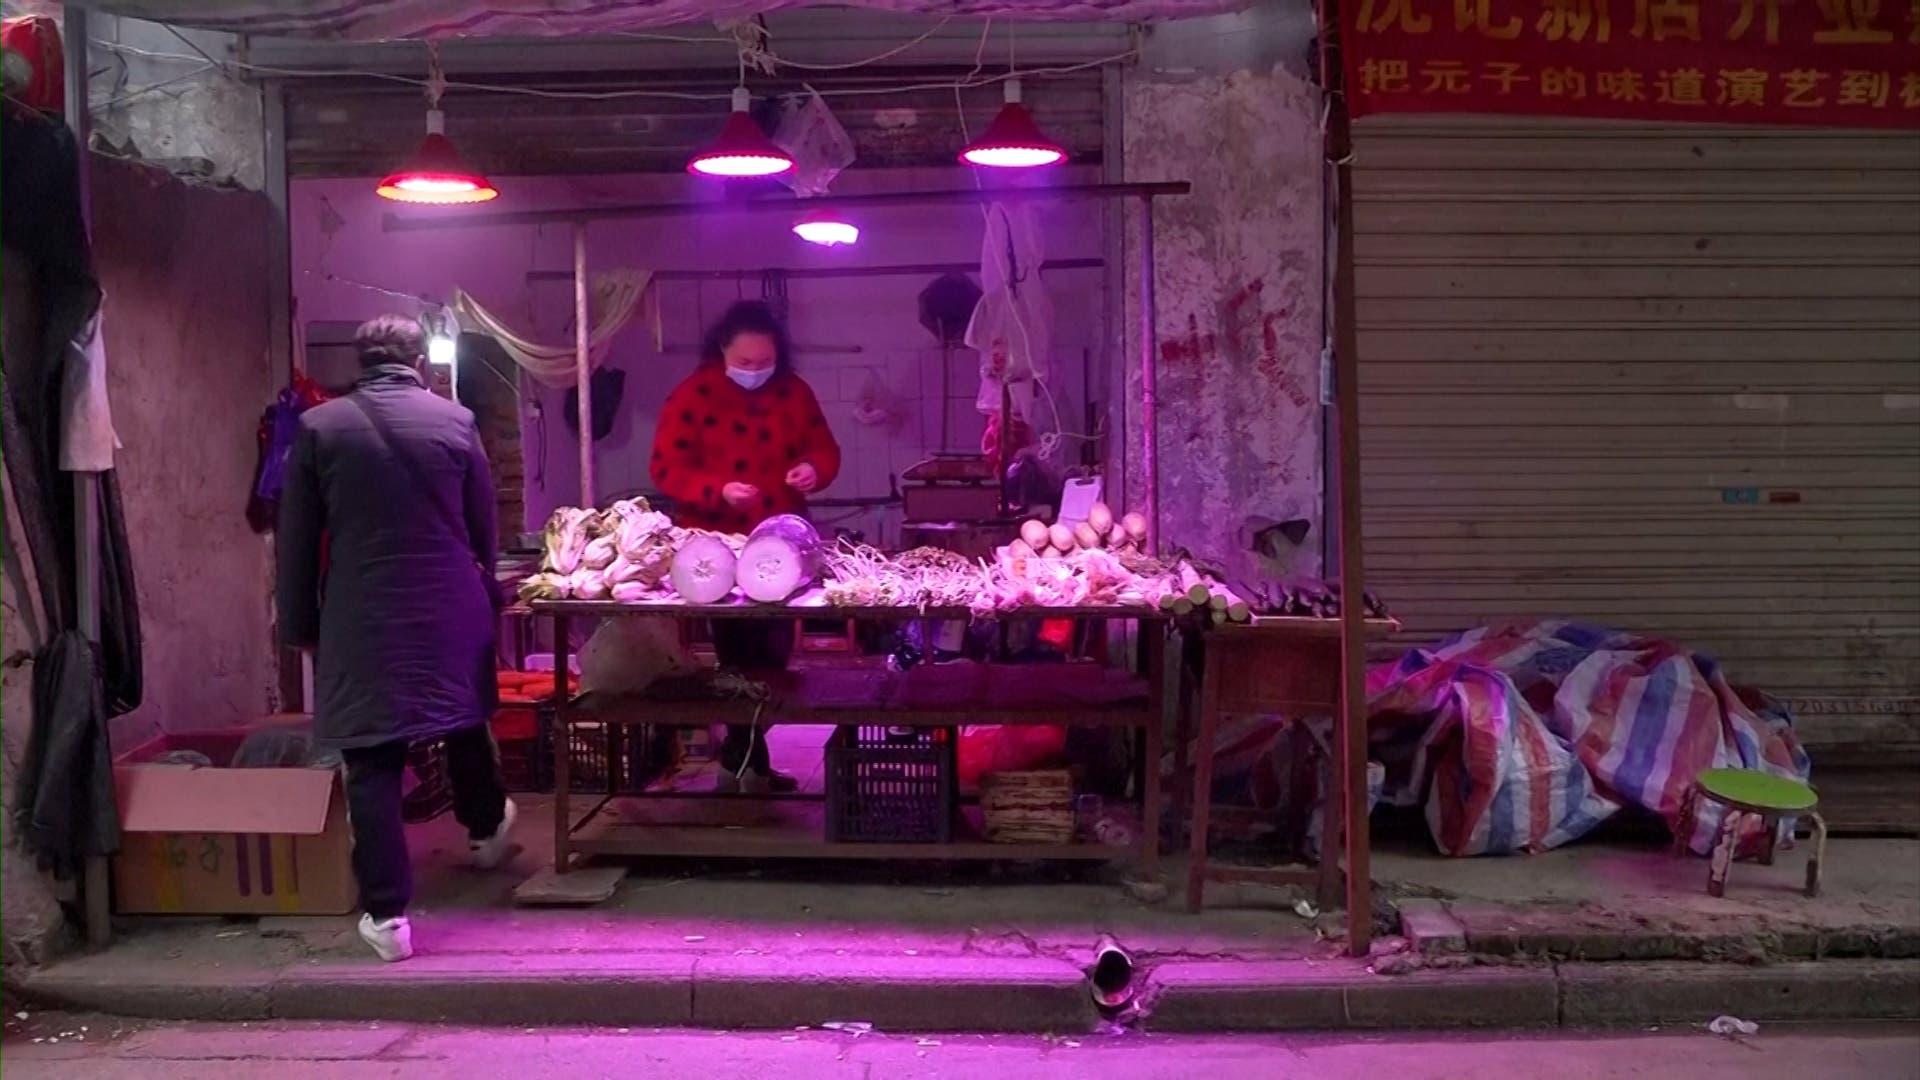 Wuhan's wet markets struggle to survive coronavirus blow (File photo)